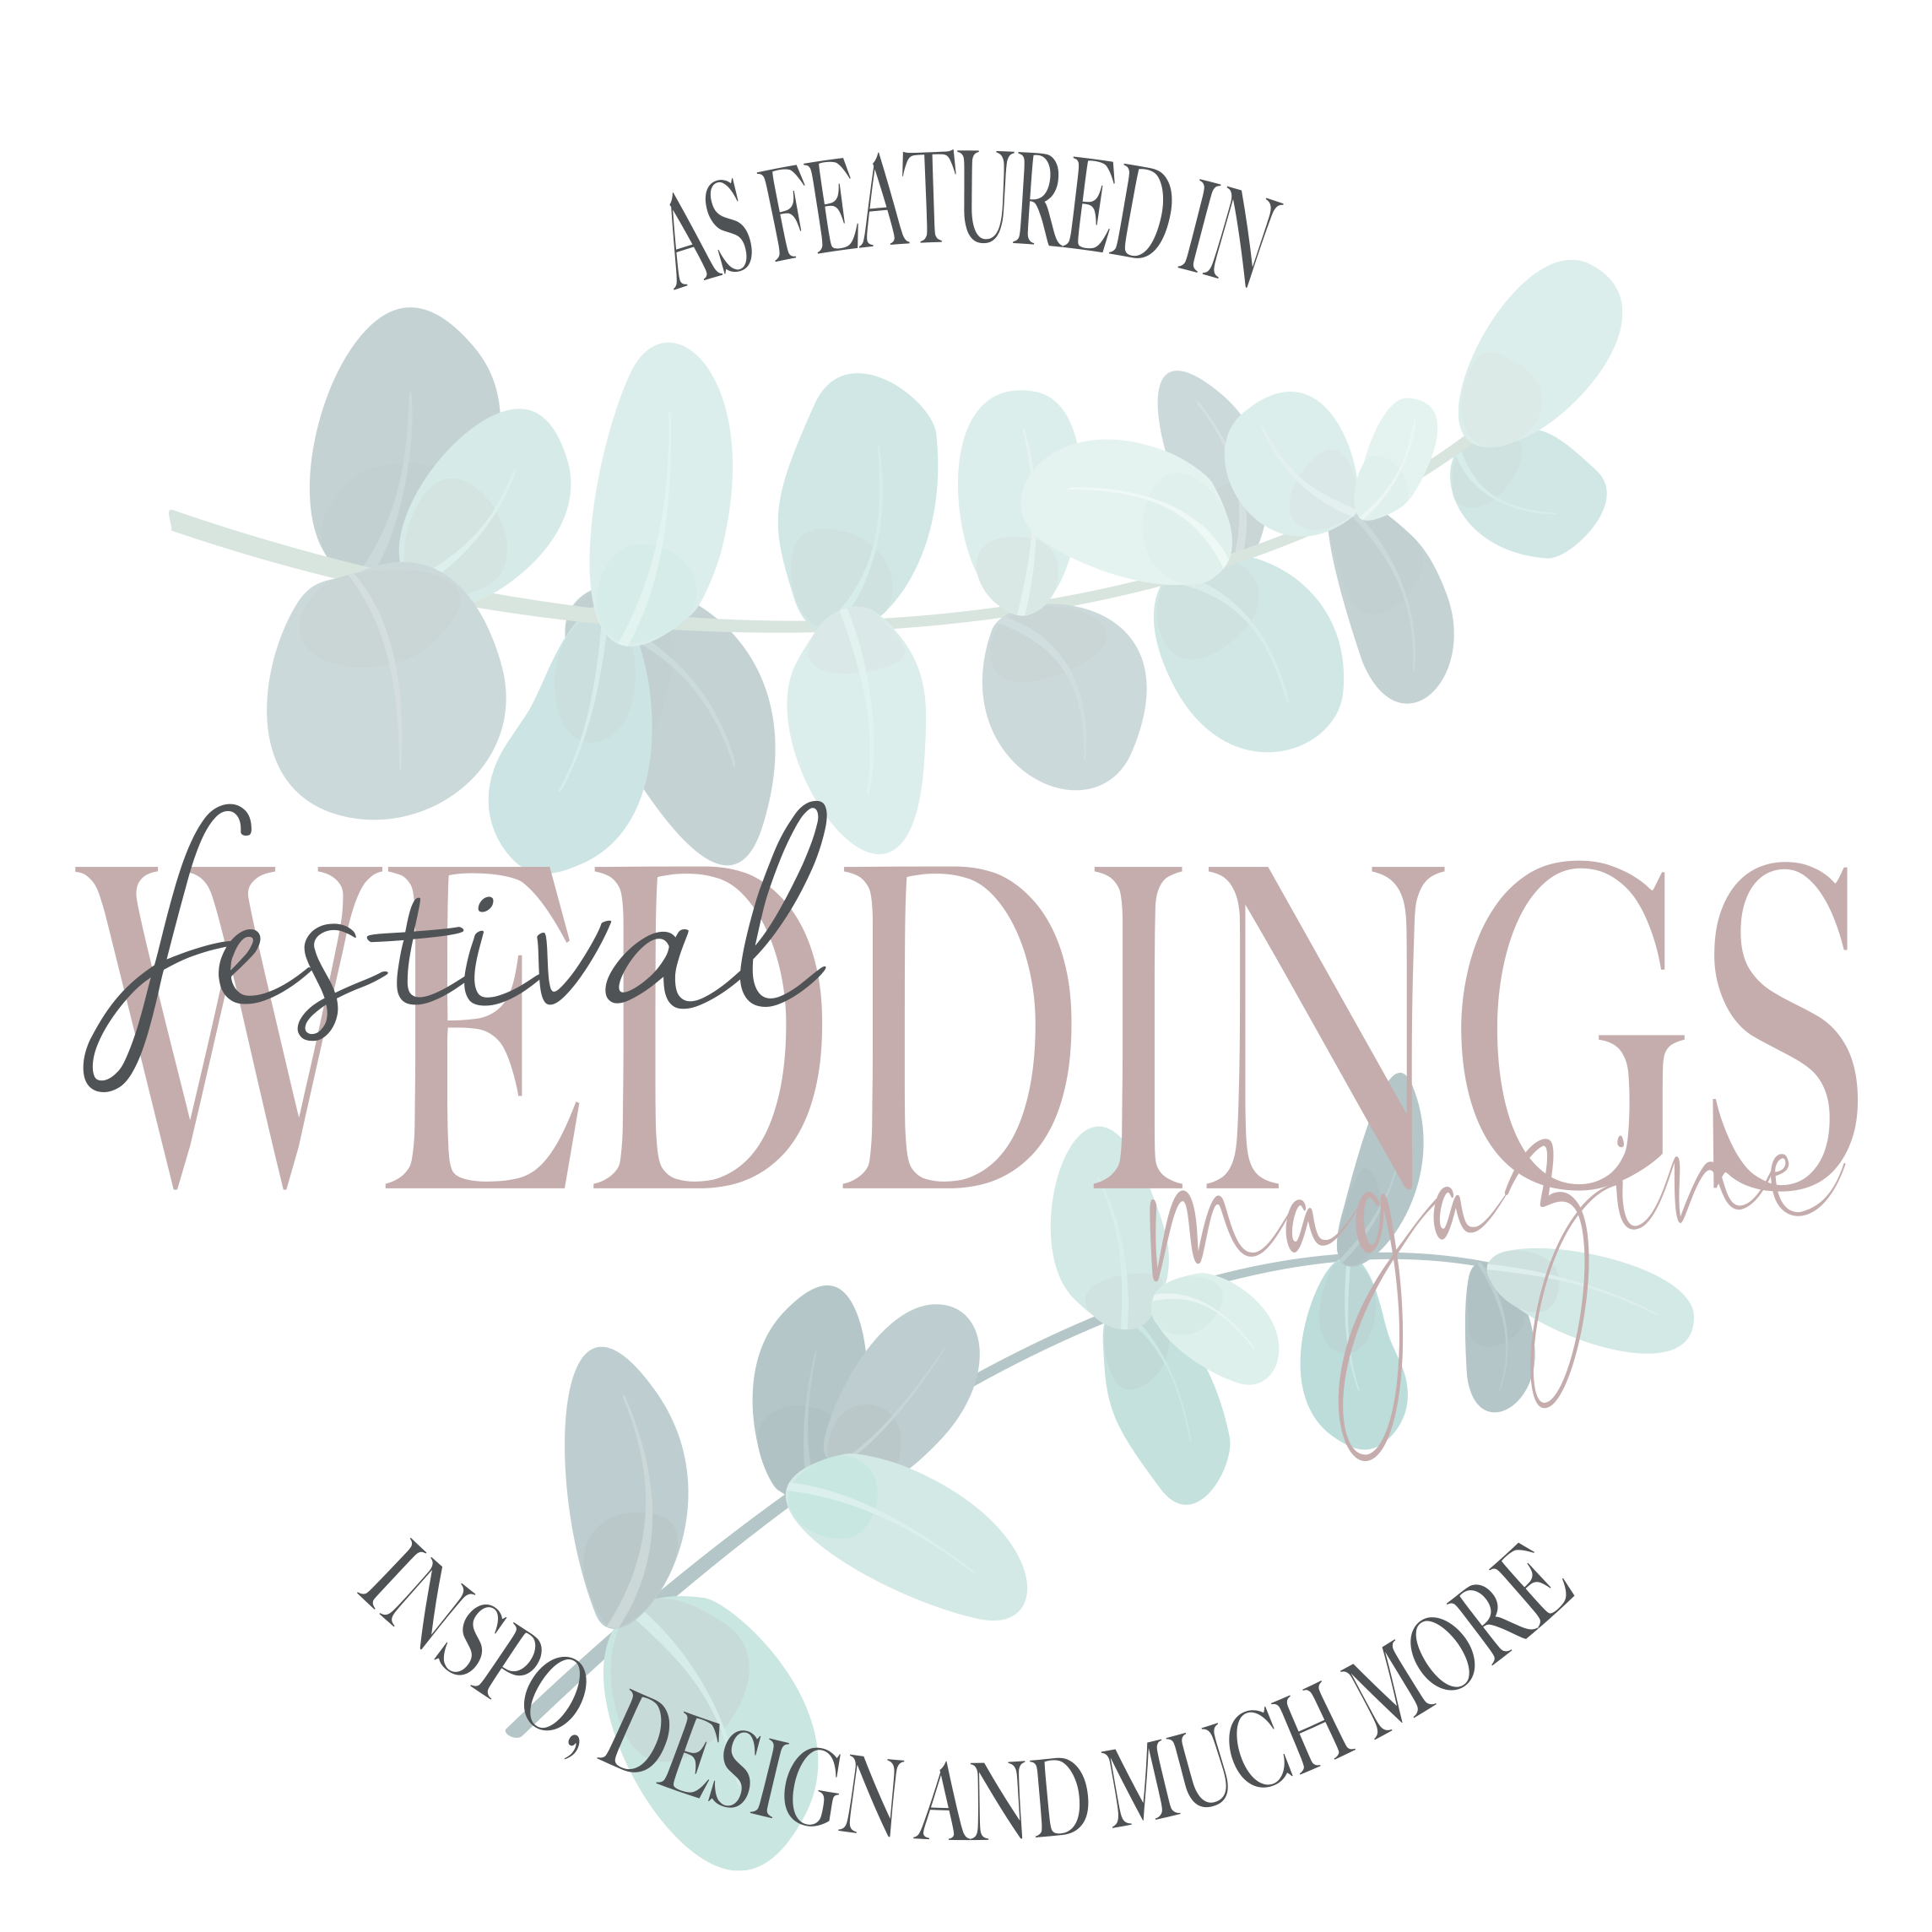 Festival Weddings Magazine